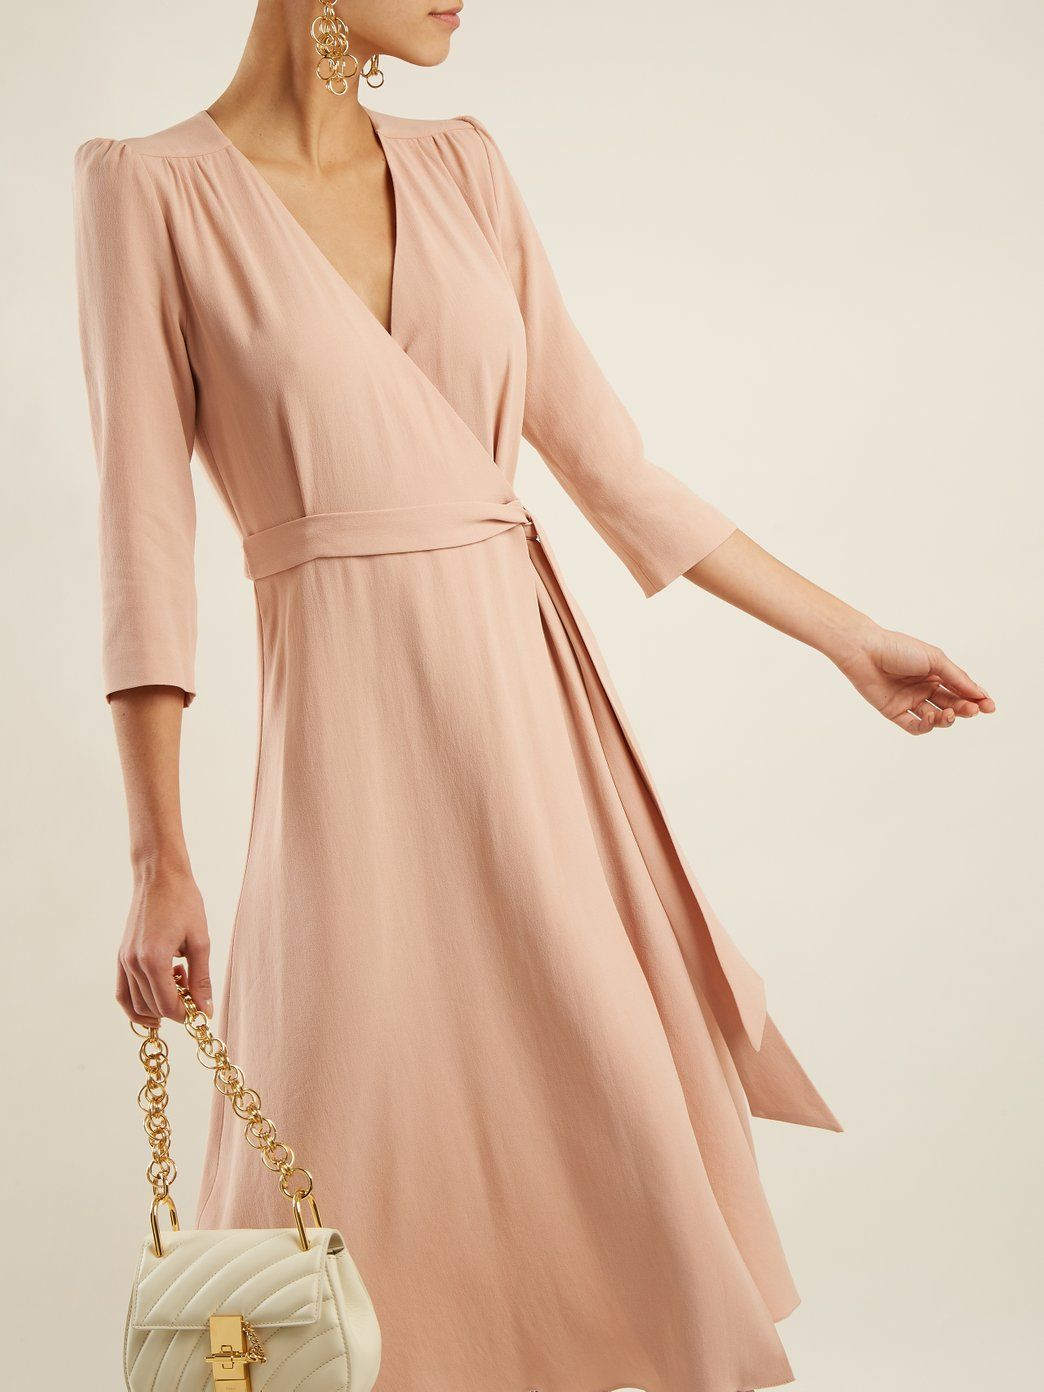 Glenda Cady Wrap Dress Goat Matchesfashion Com Wrap Dress Dresses Fashion [ 1392 x 1044 Pixel ]